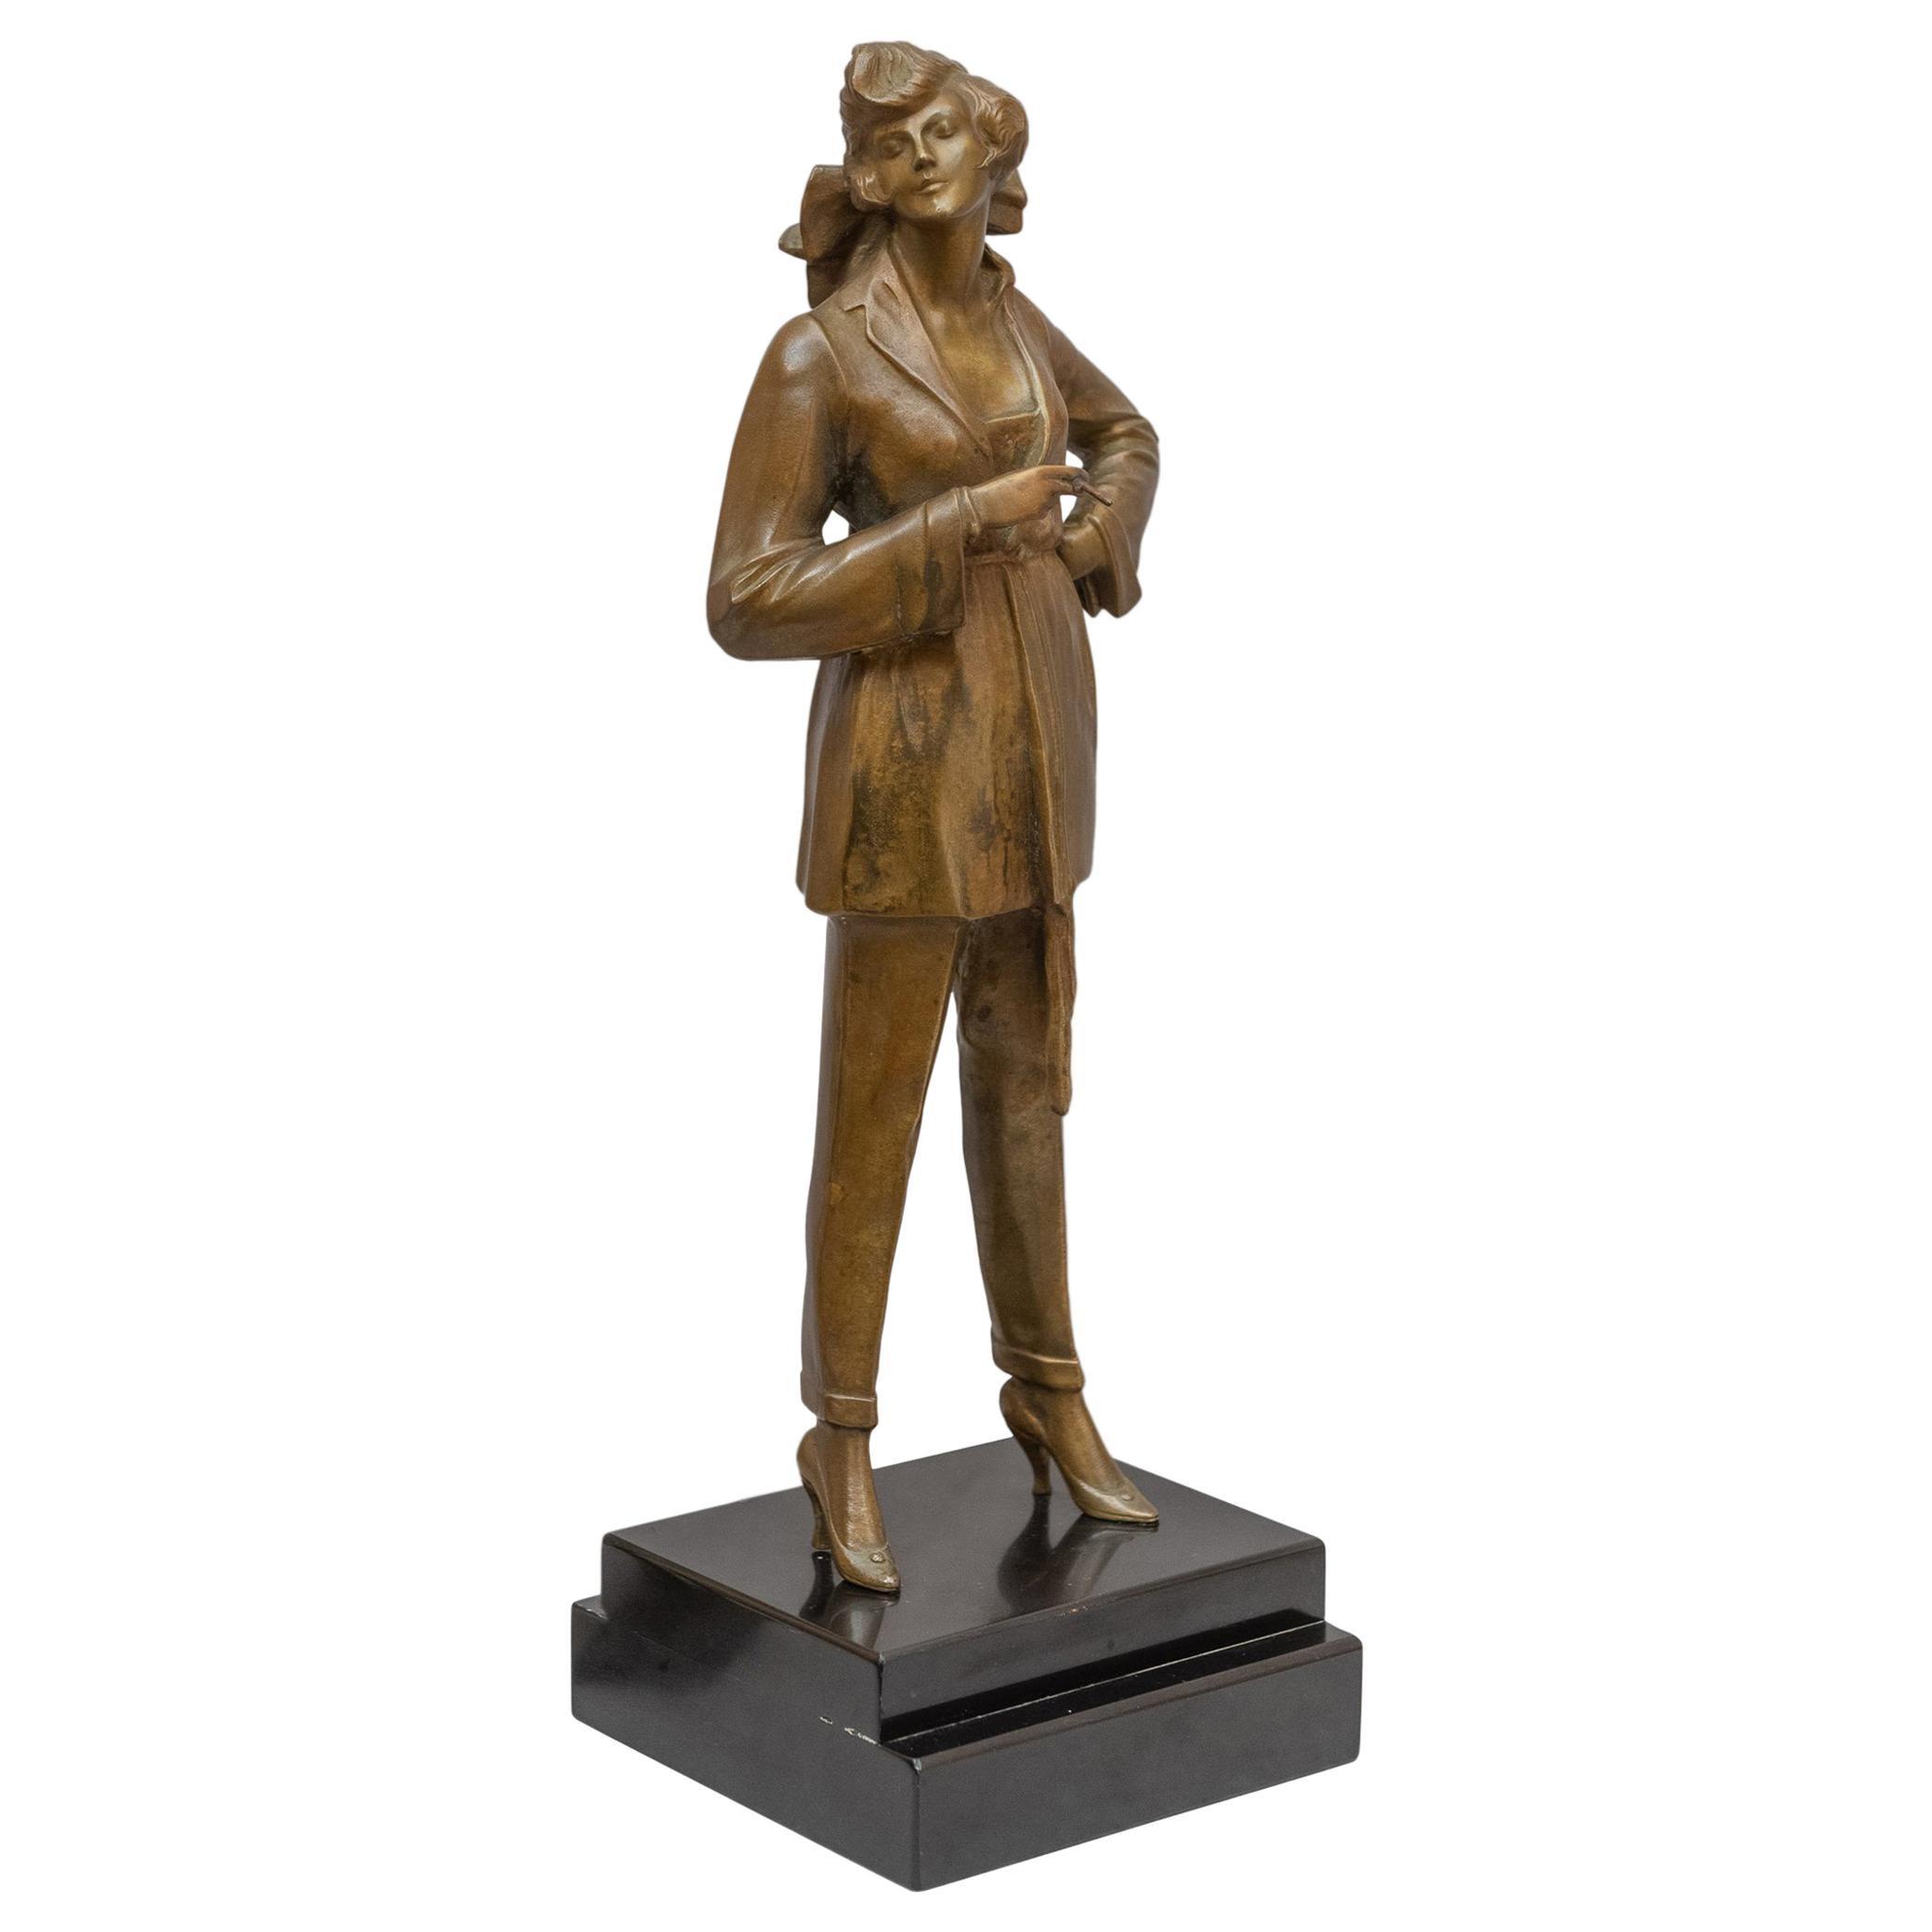 Art Deco Bronze of a Classy Woman by Bruno Zach ca. 1930s